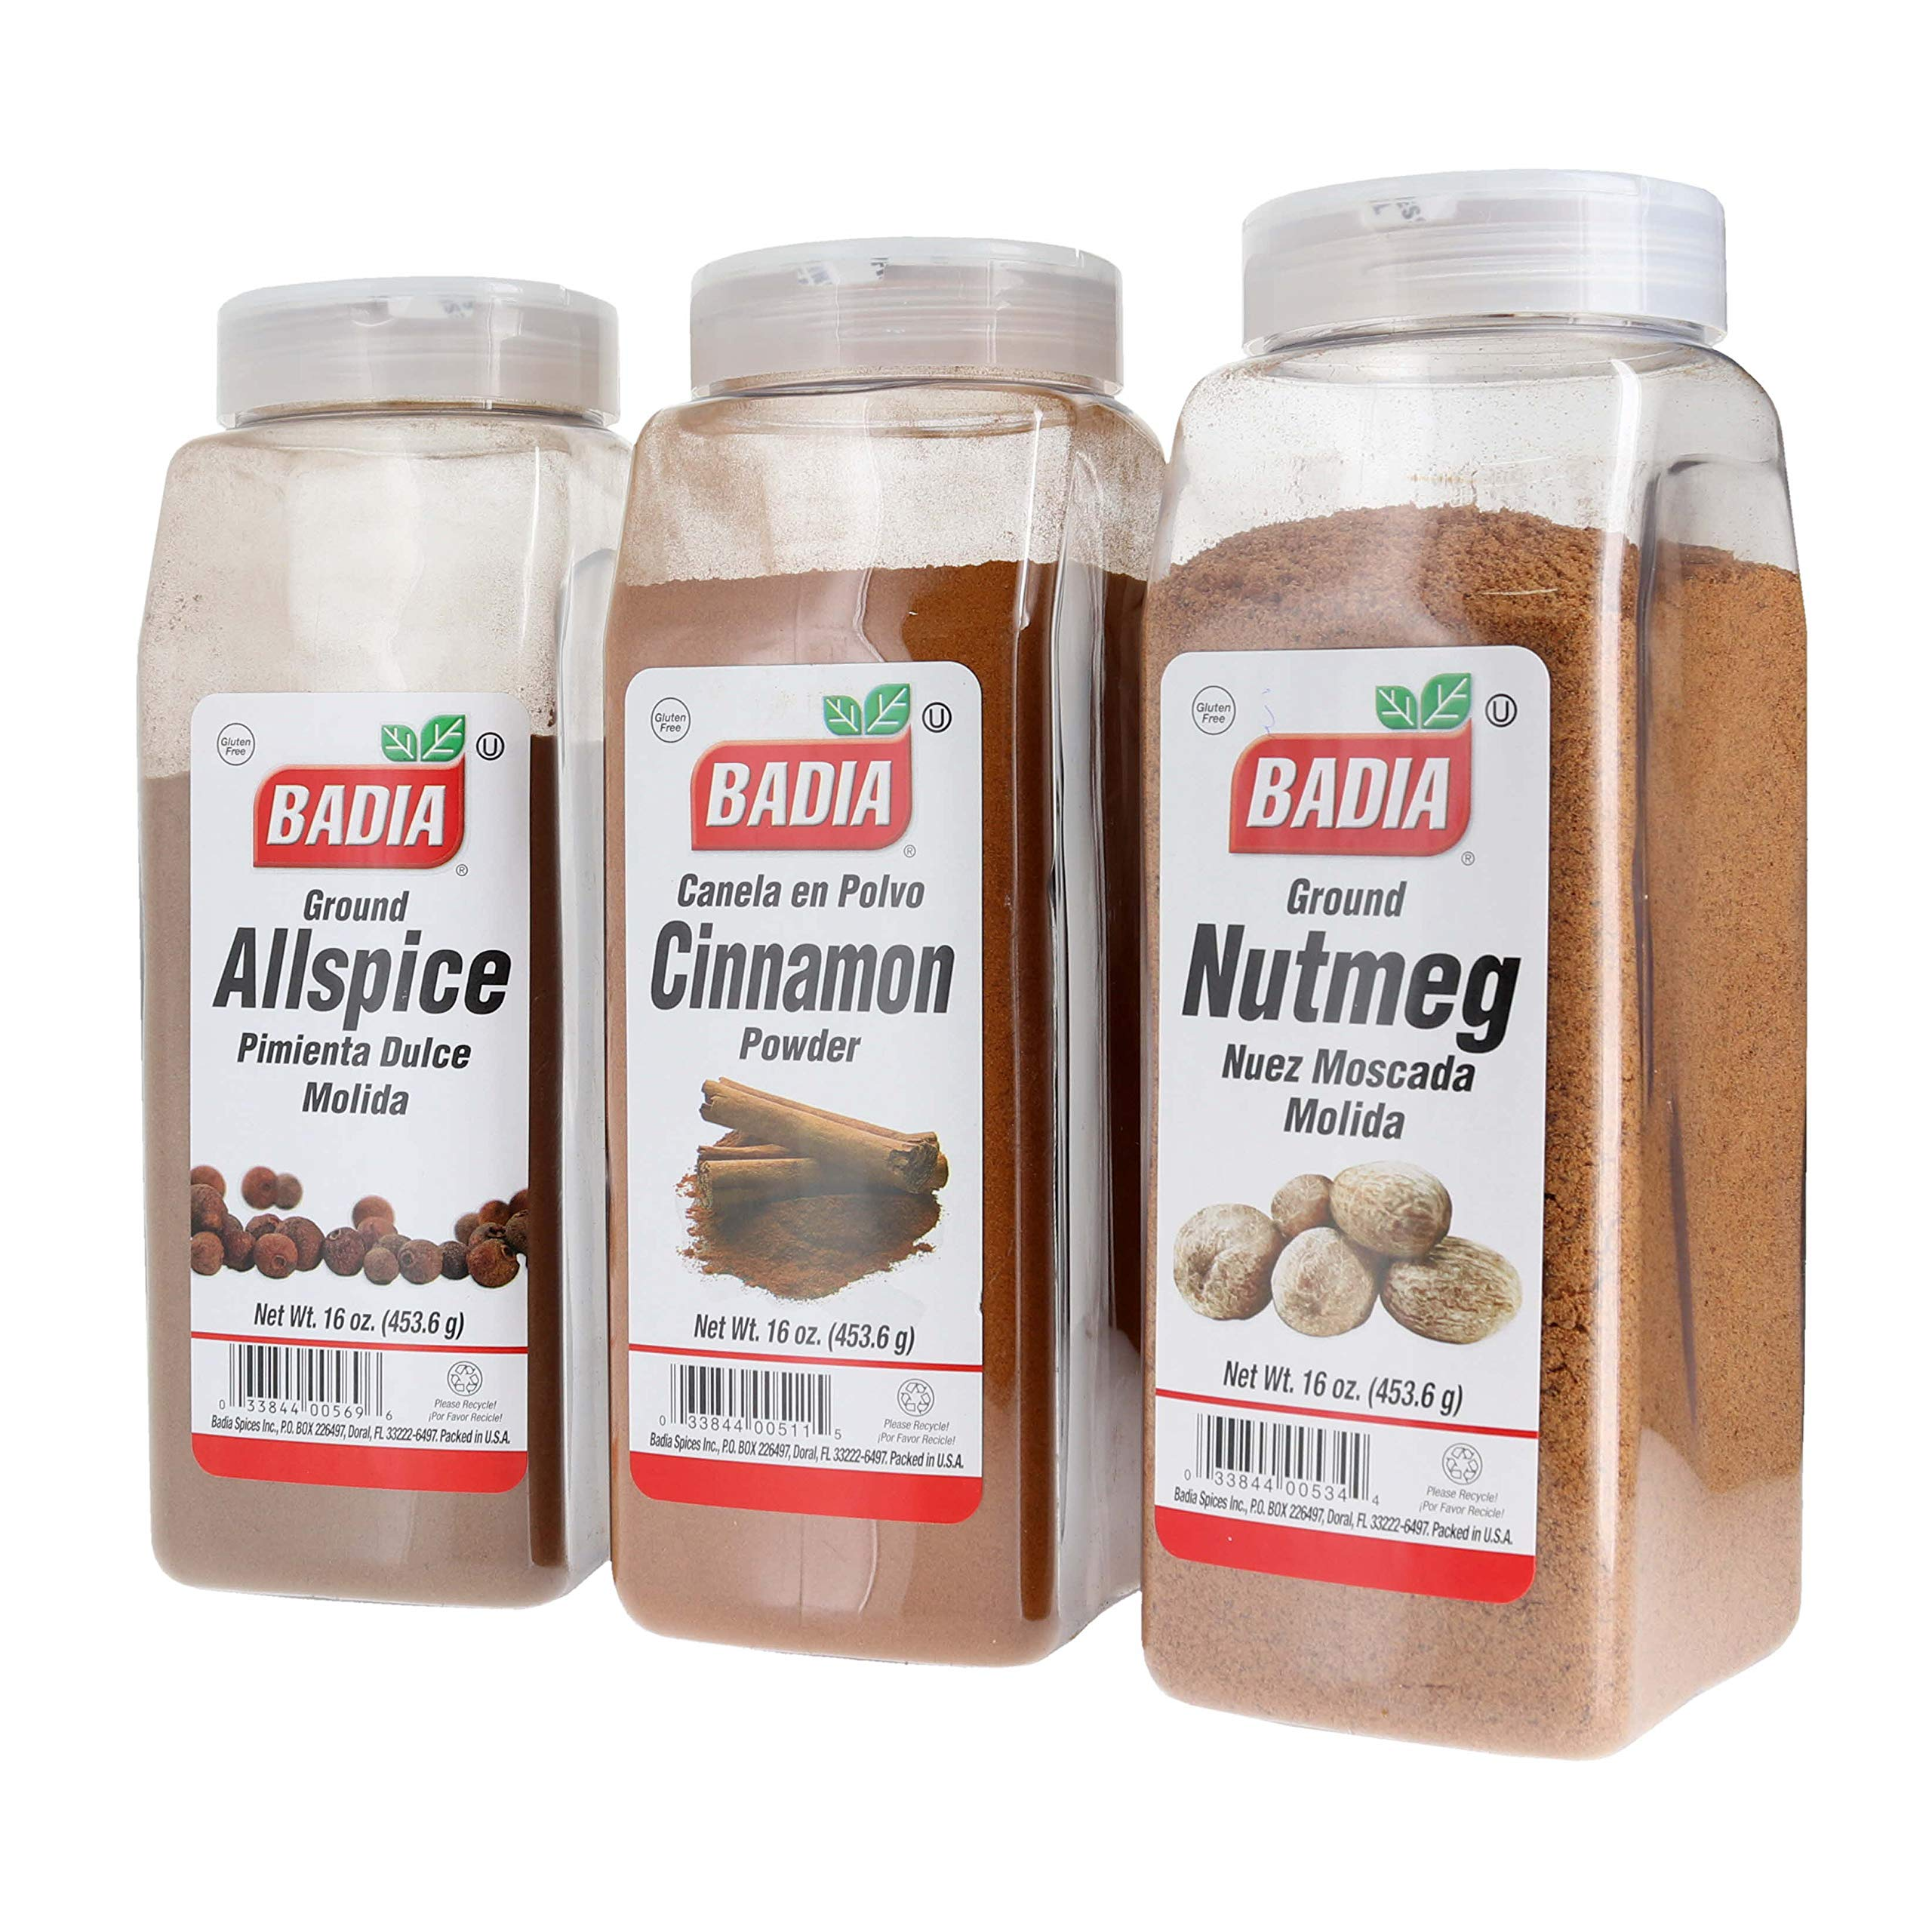 Badia Ground Allspice, Cinnamon Powder, and Ground Nutmeg Spice Bundle (Set of 3)